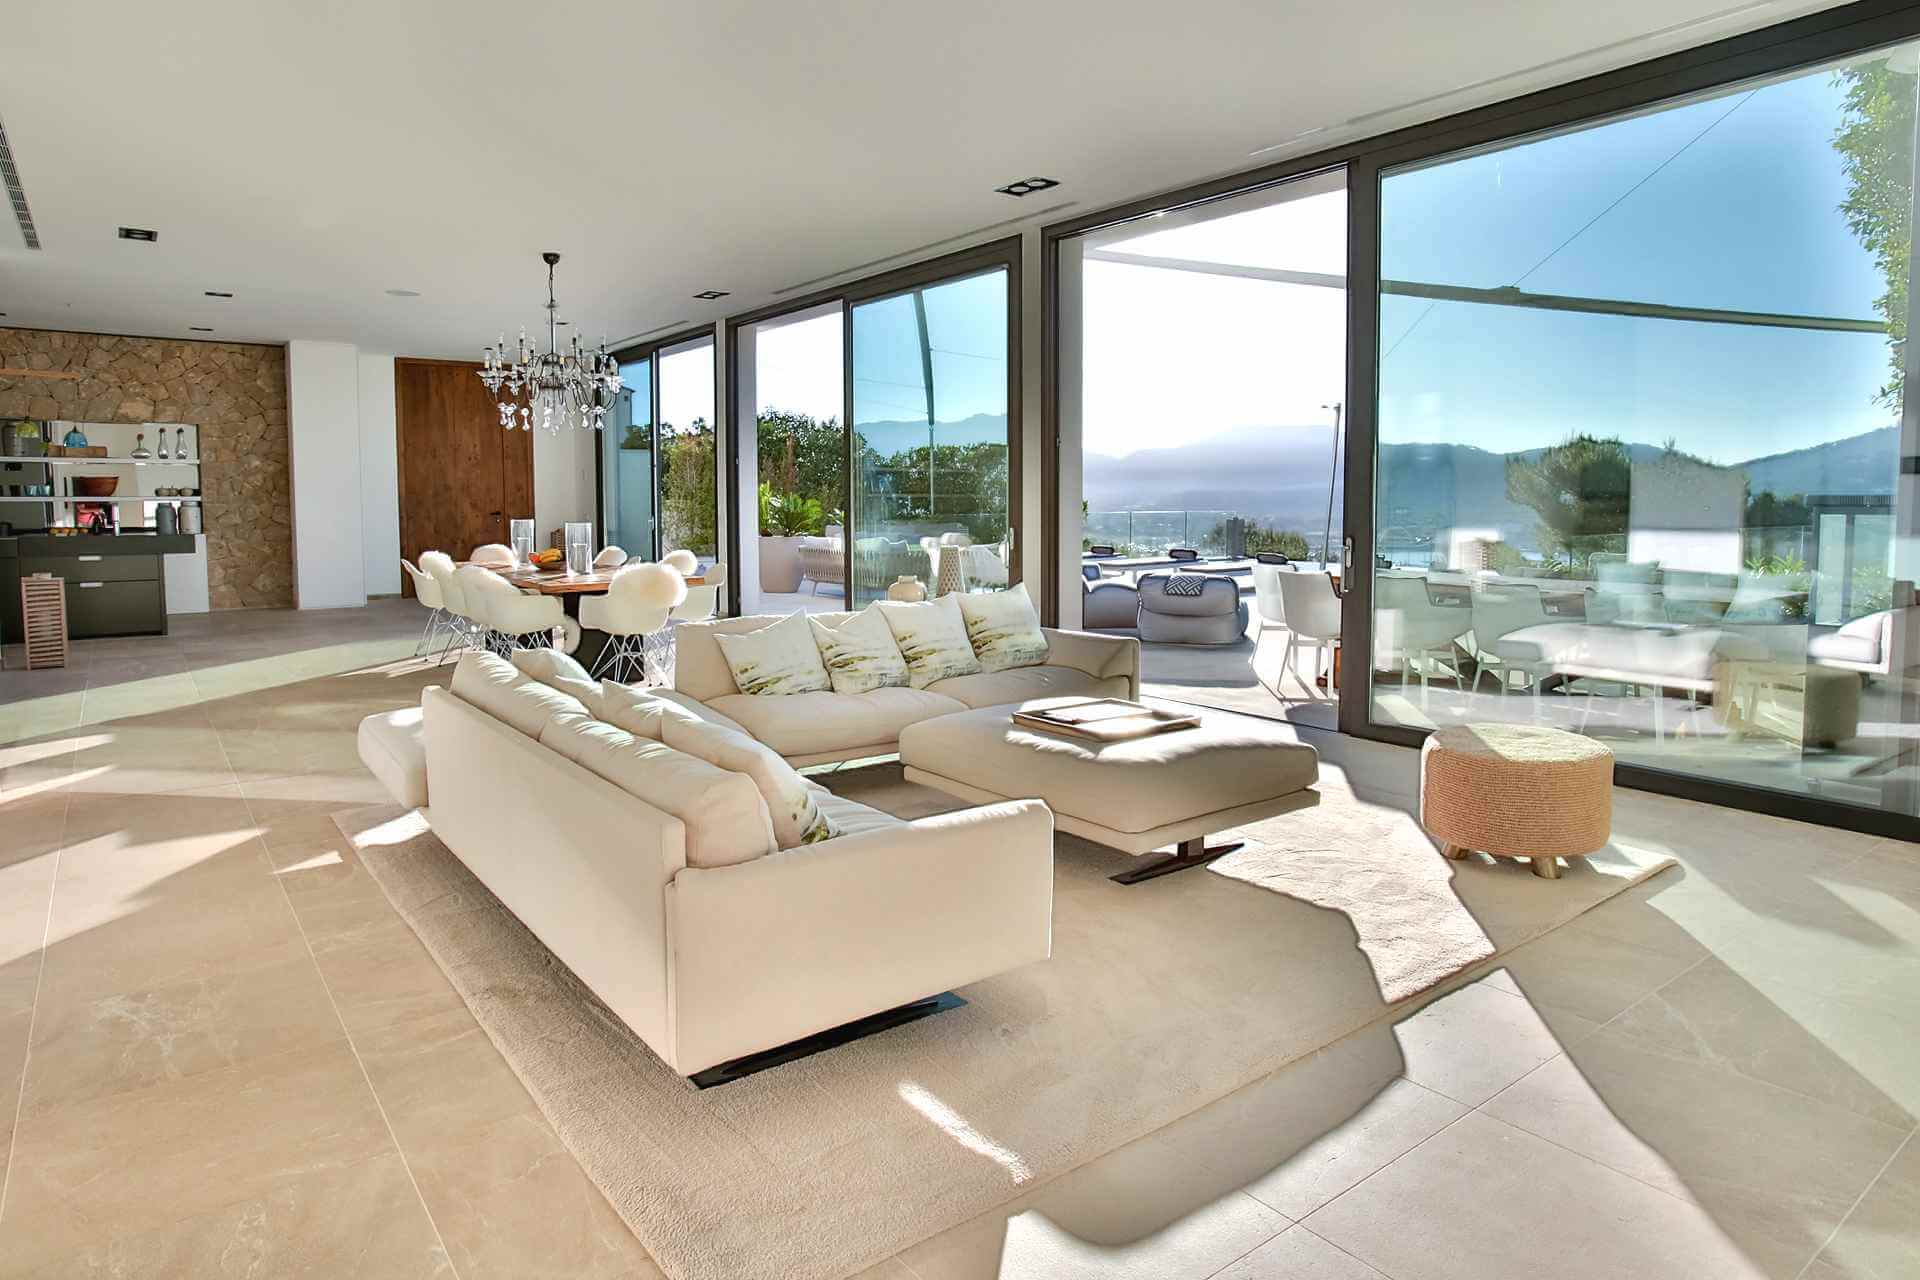 01-353 Villa with indoor pool Mallorca Southwest Bild 10